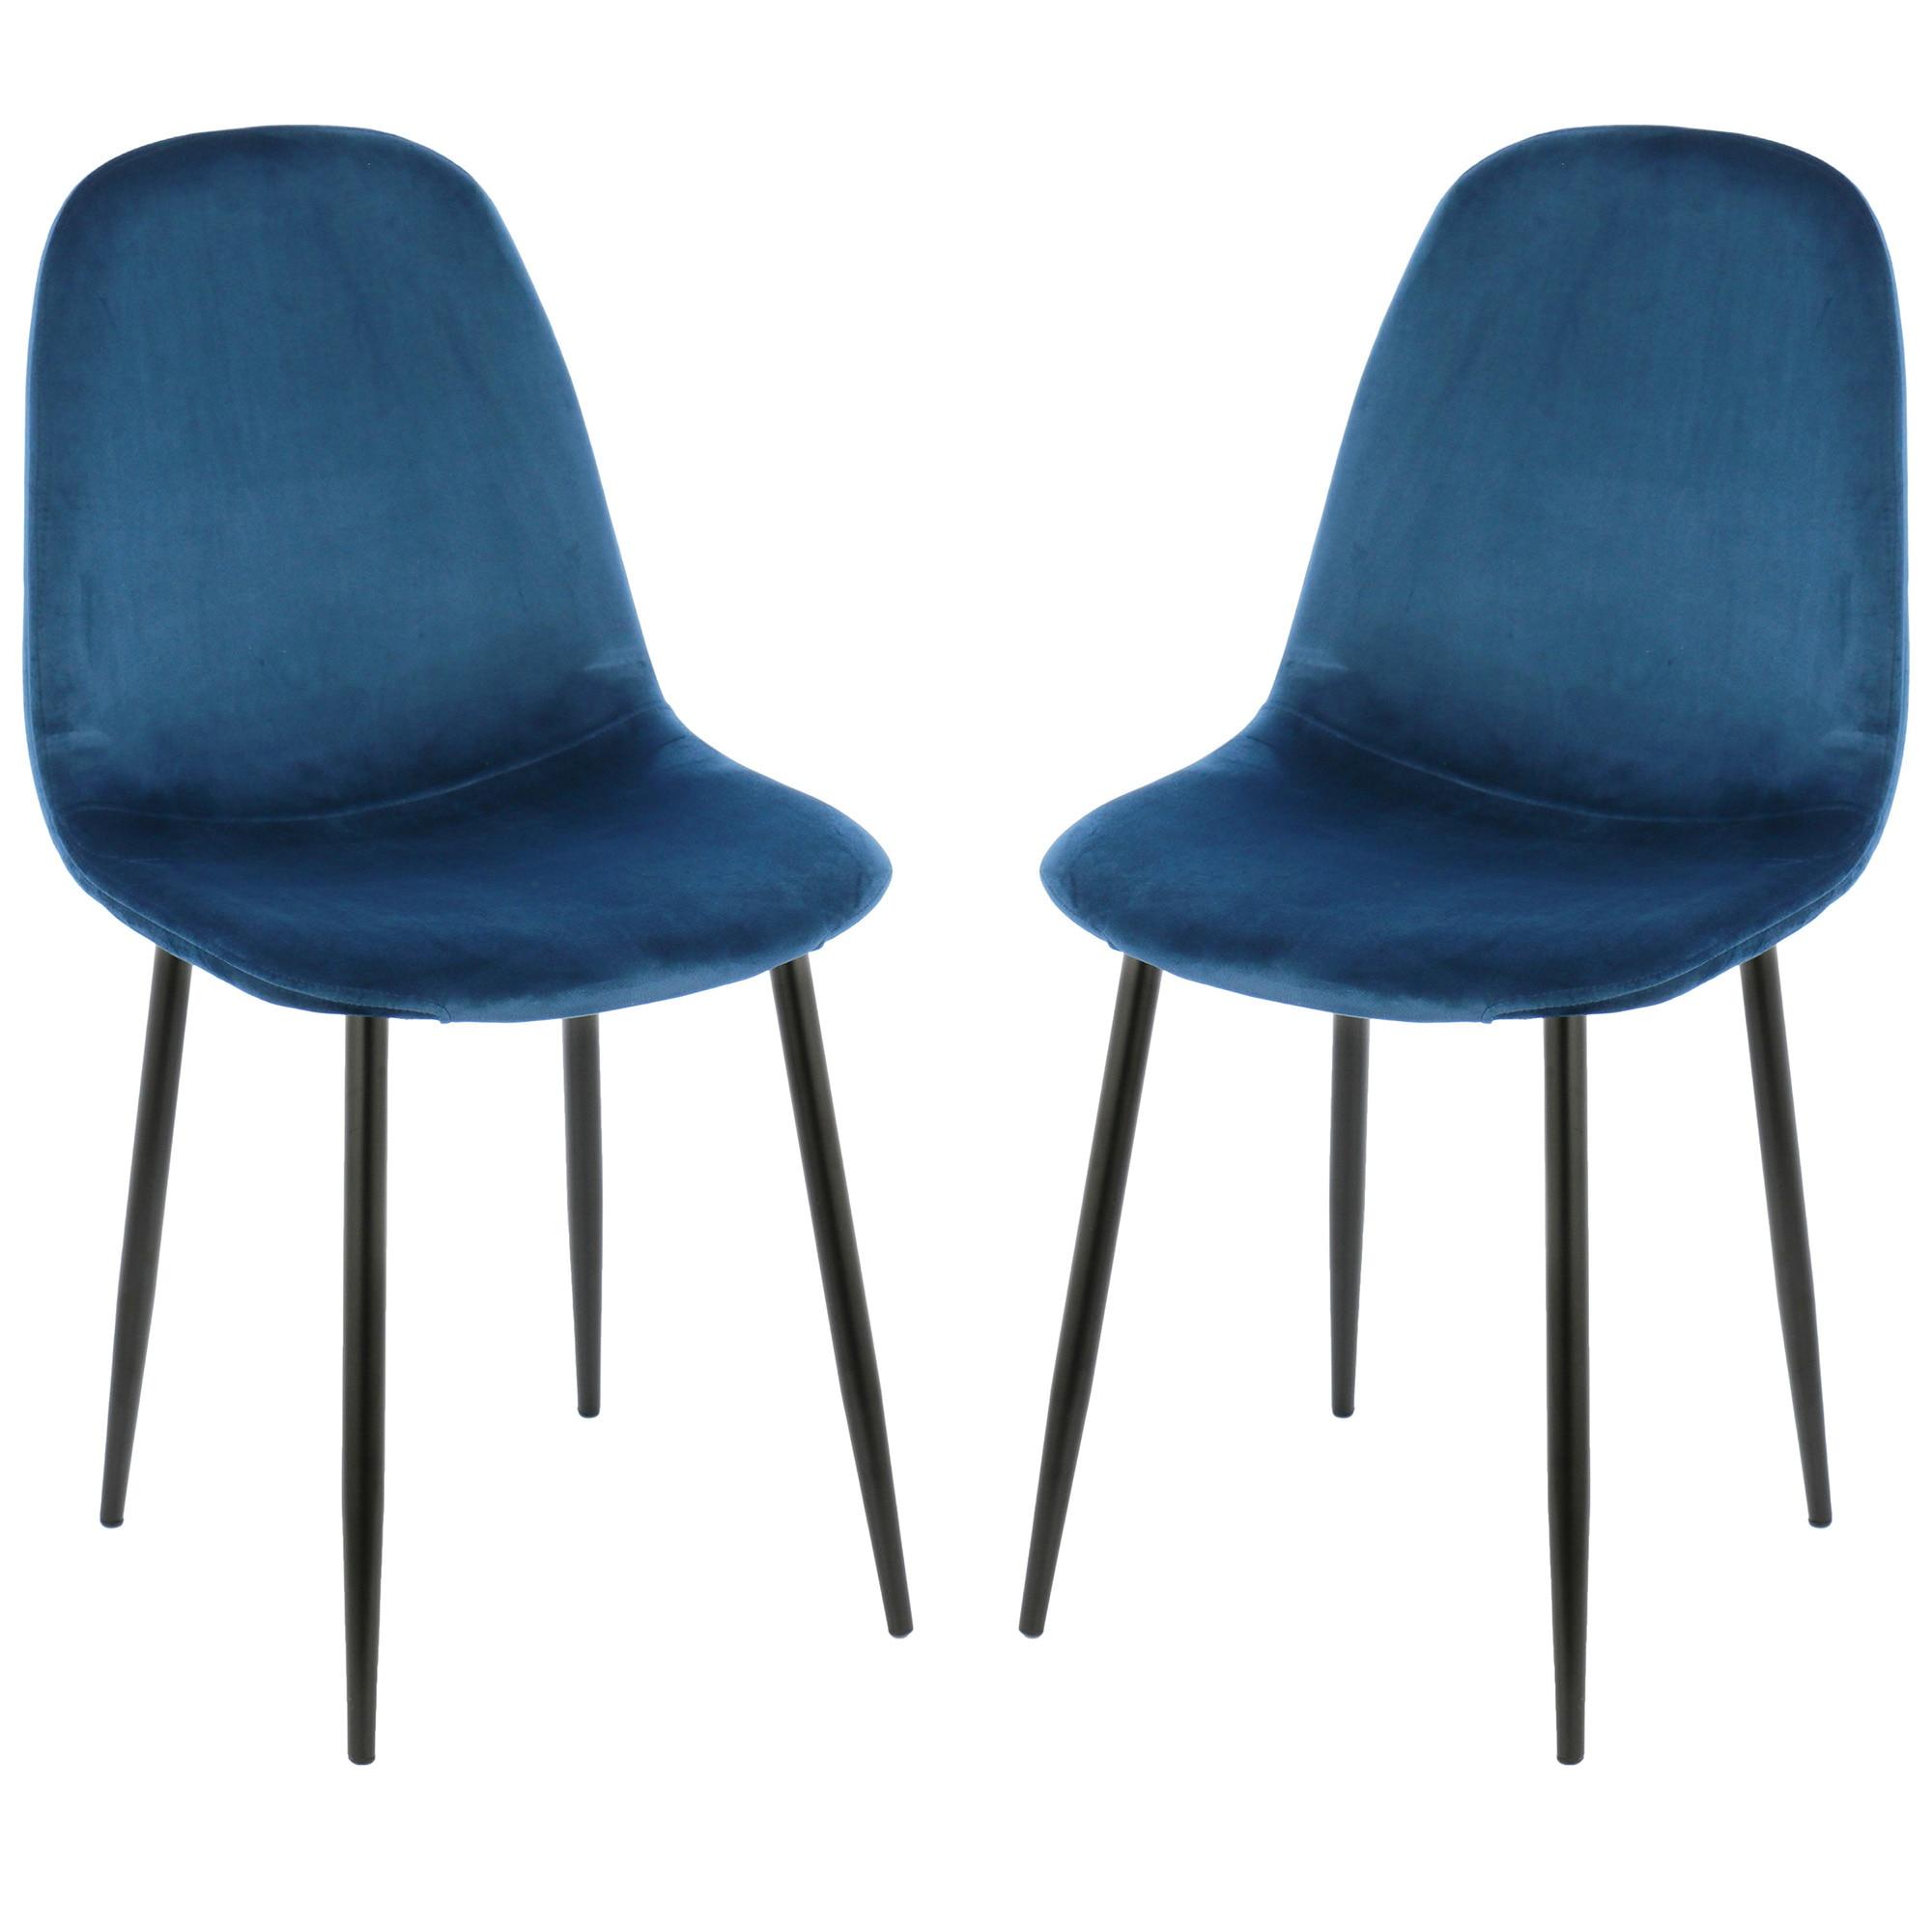 Fotografie Set 2 scaune dining / bucatarie Kring Miles, material textil, Albastru